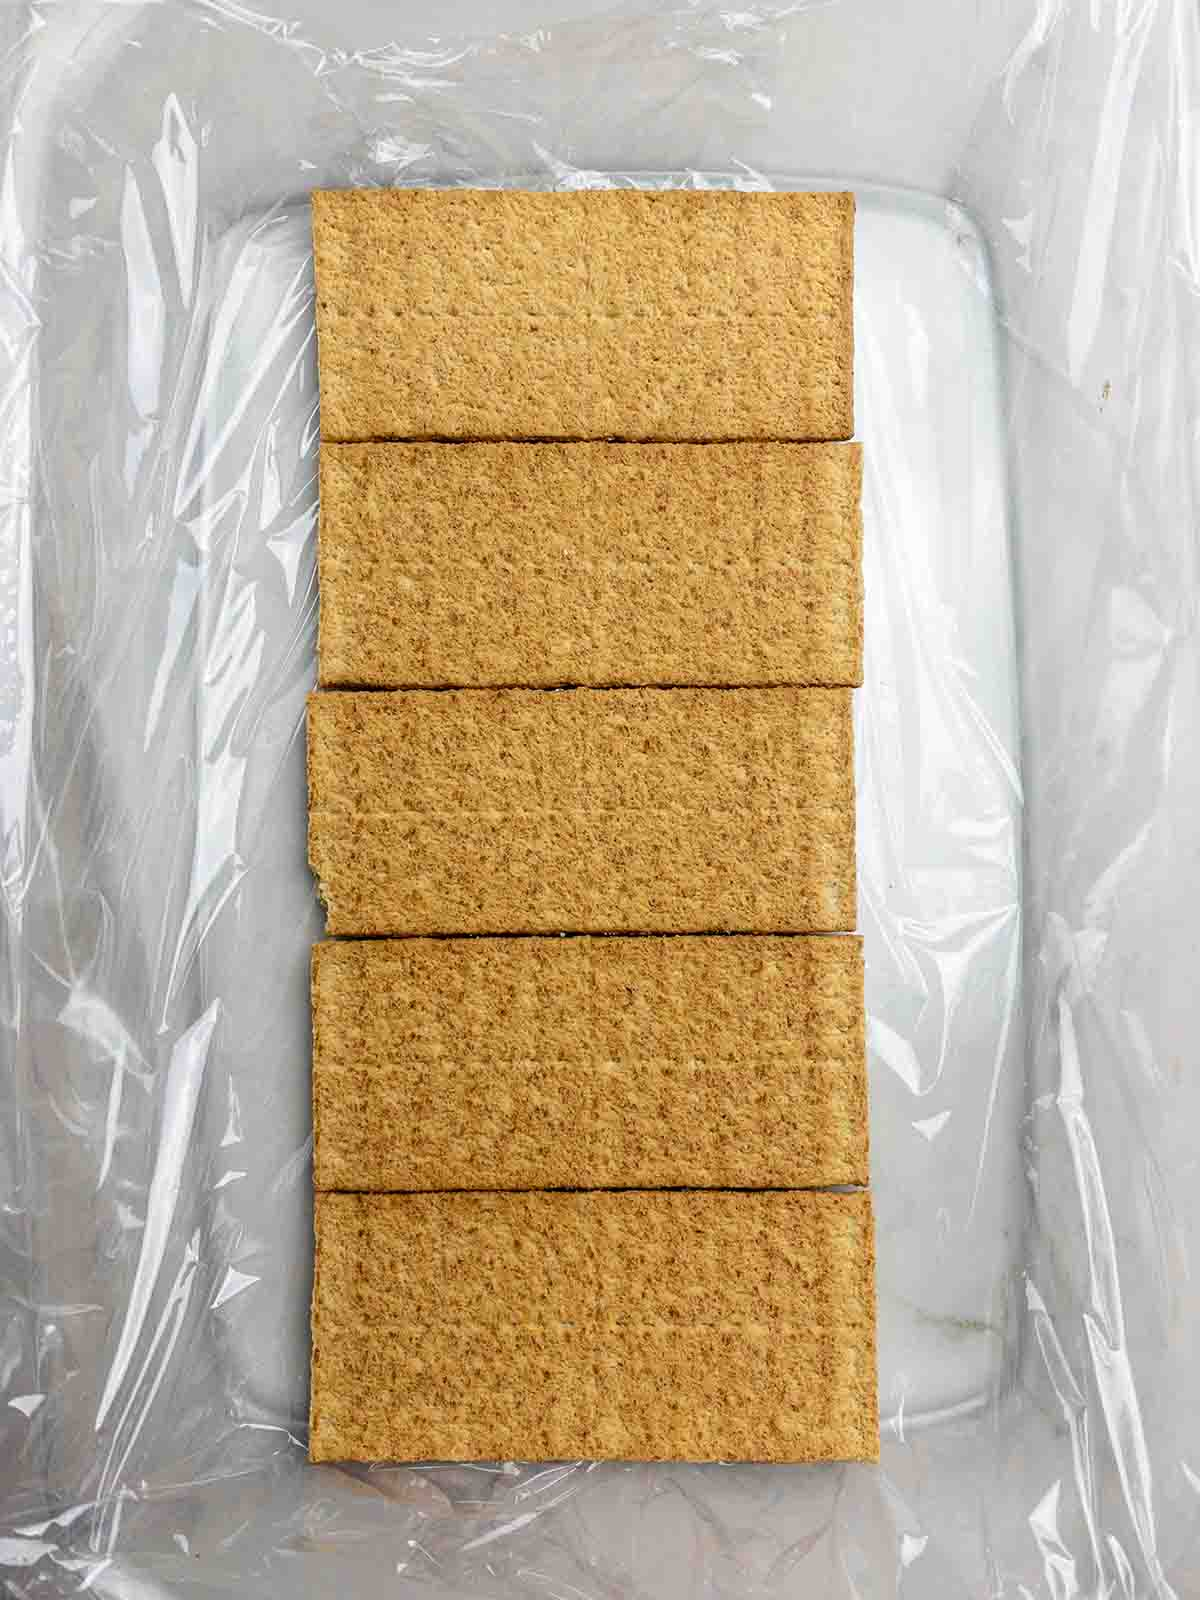 graham cracker ice cream sandwiches